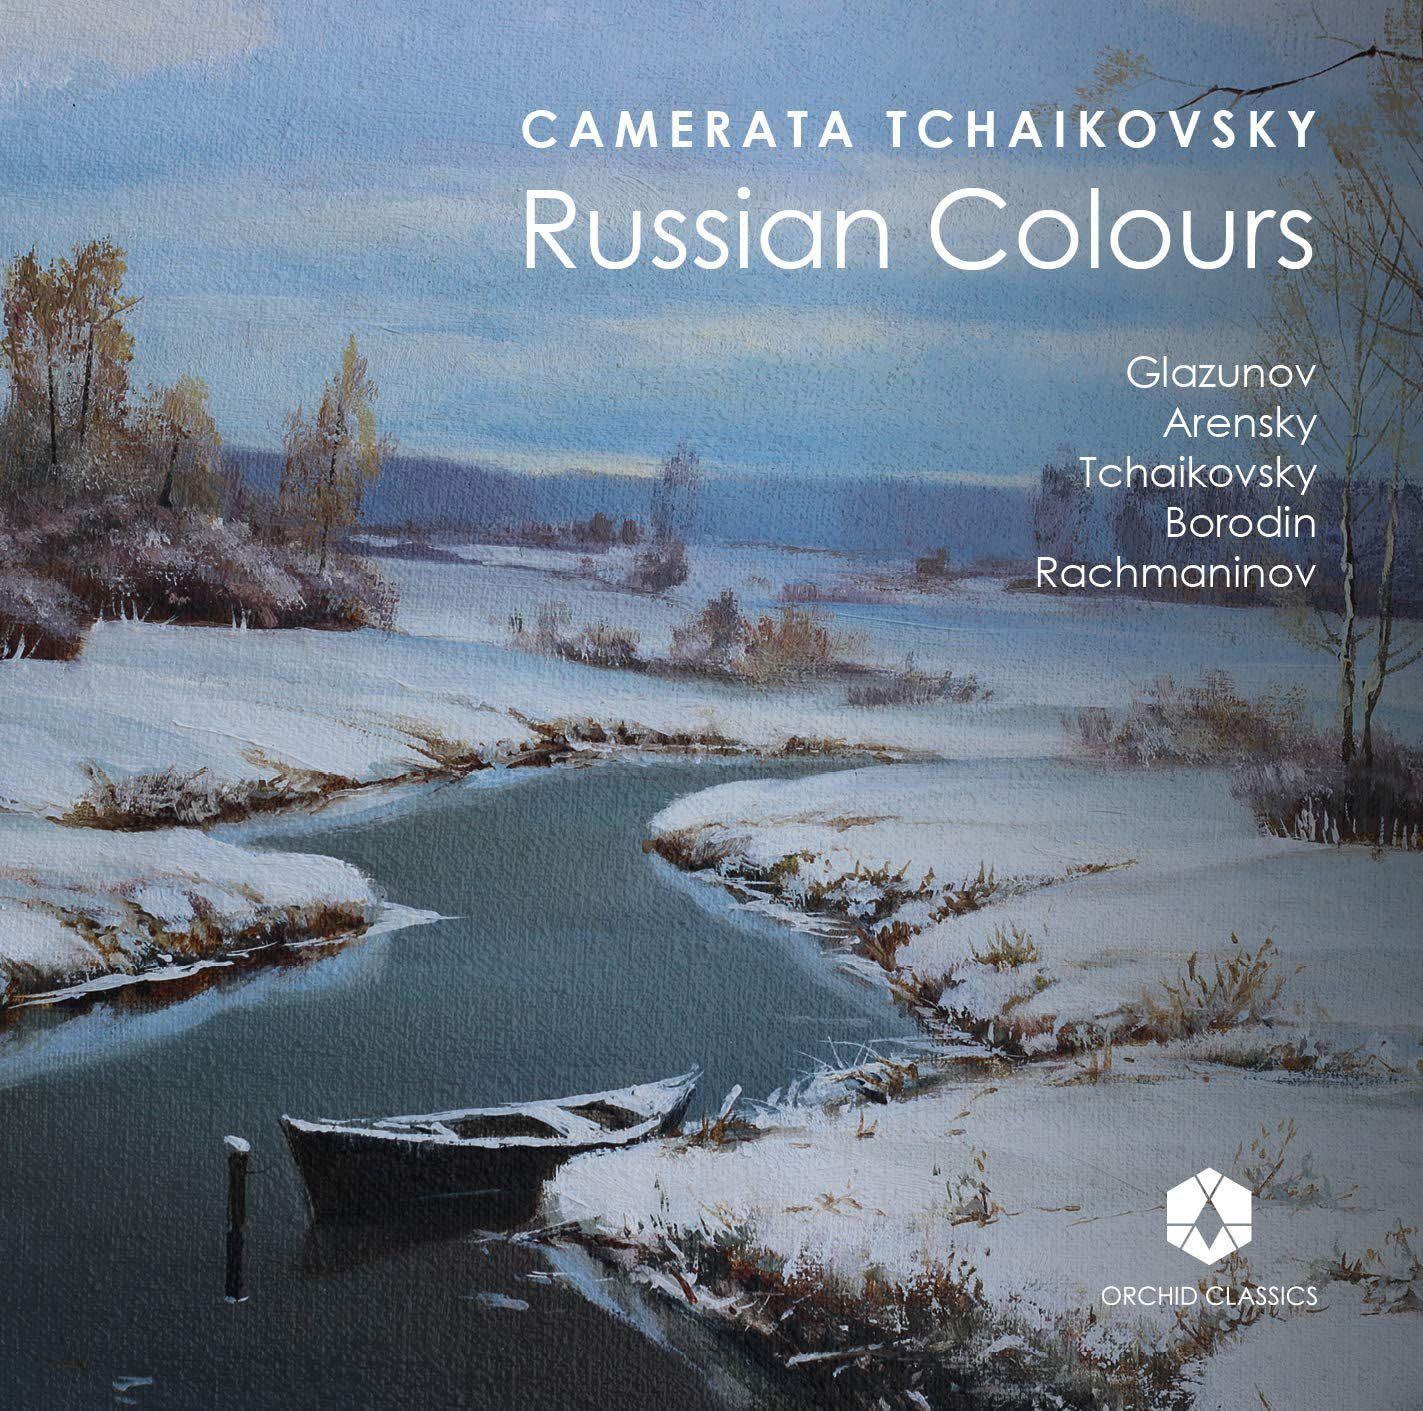 Photo No.1 of Russian Colours - Camerata Tchaikovsky & Yuri Zhislin